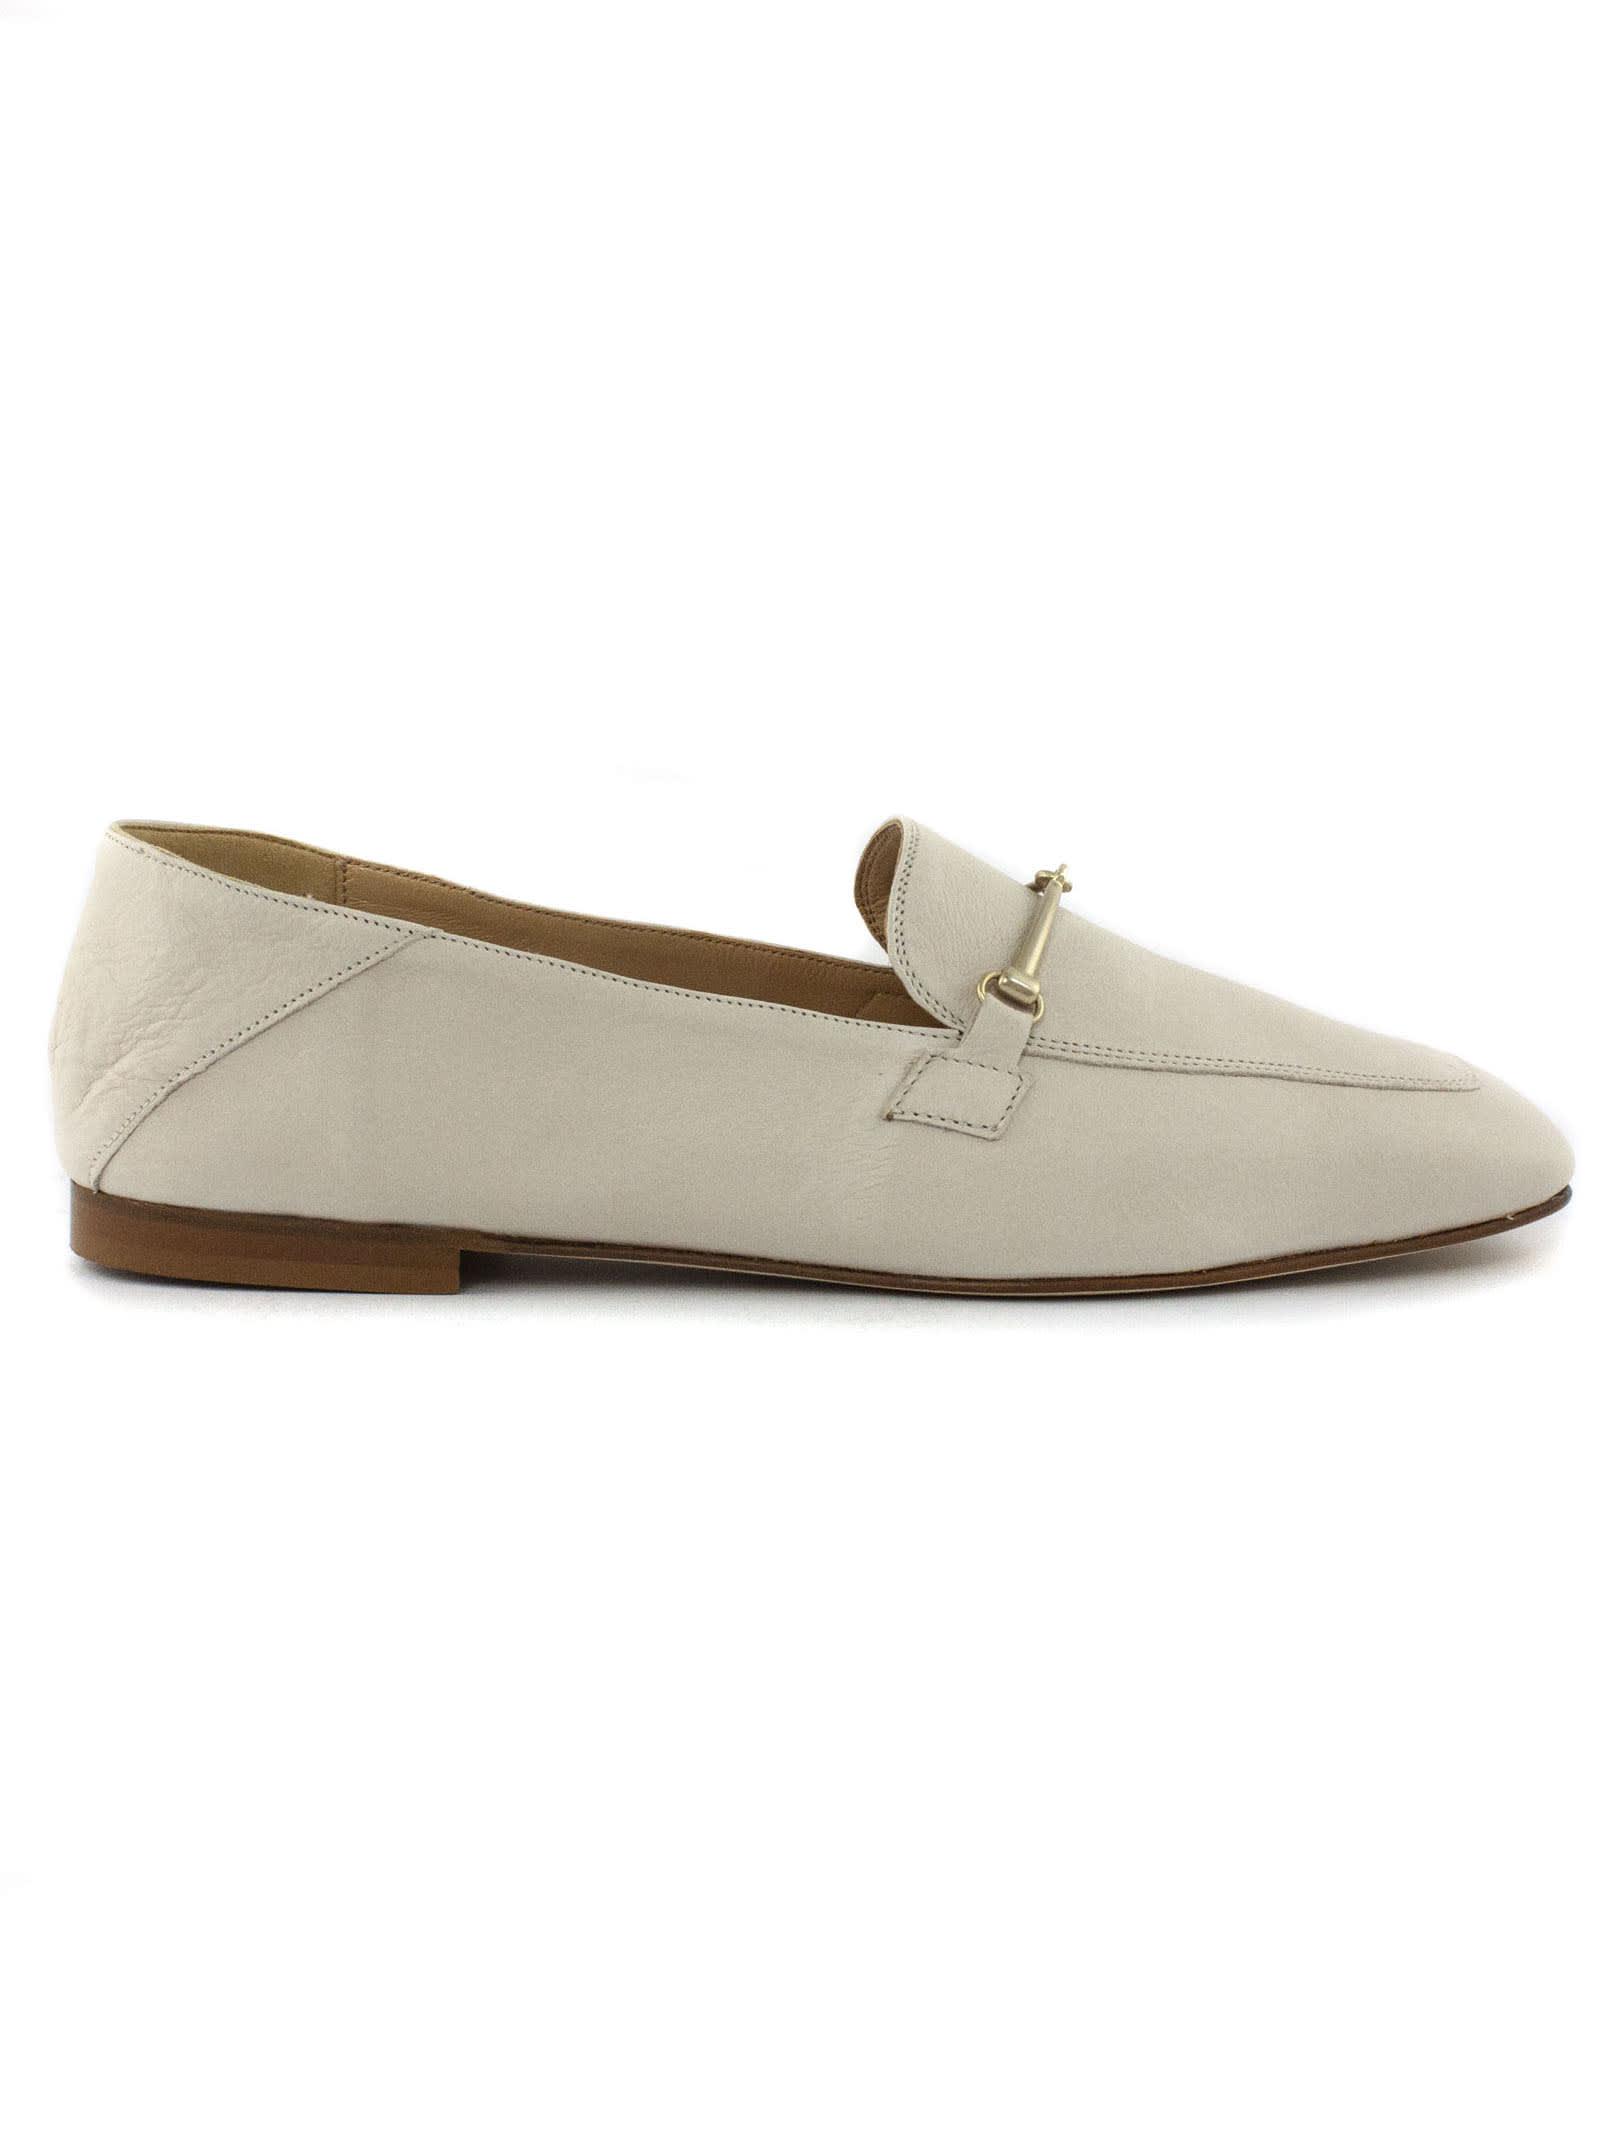 Ecru Leather Loafer